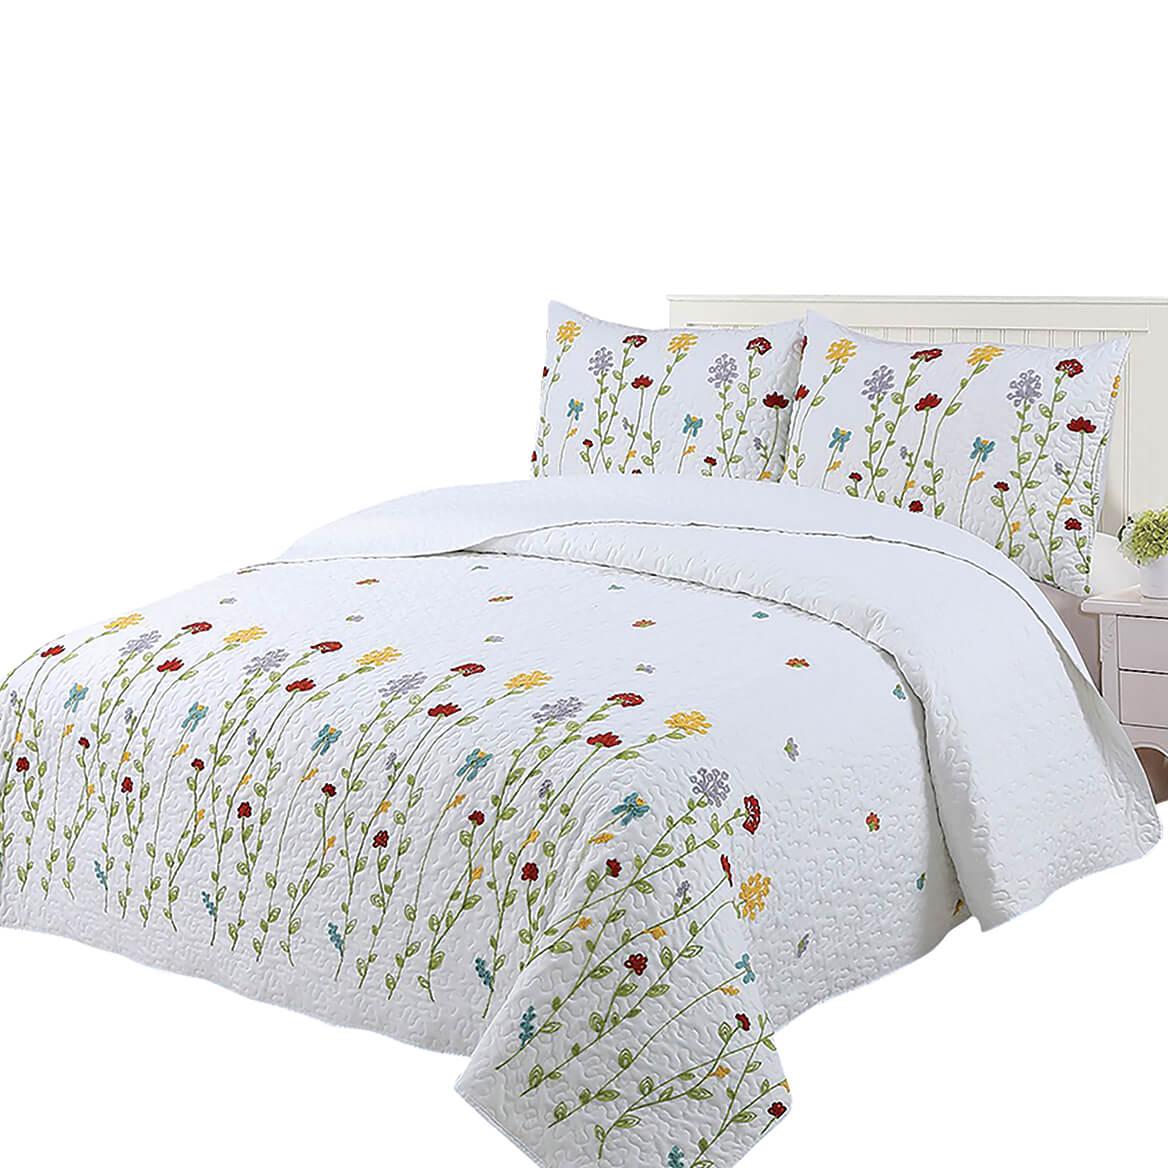 Wild Flowers Embroidered Bedspread Set by OakRidge®-369226